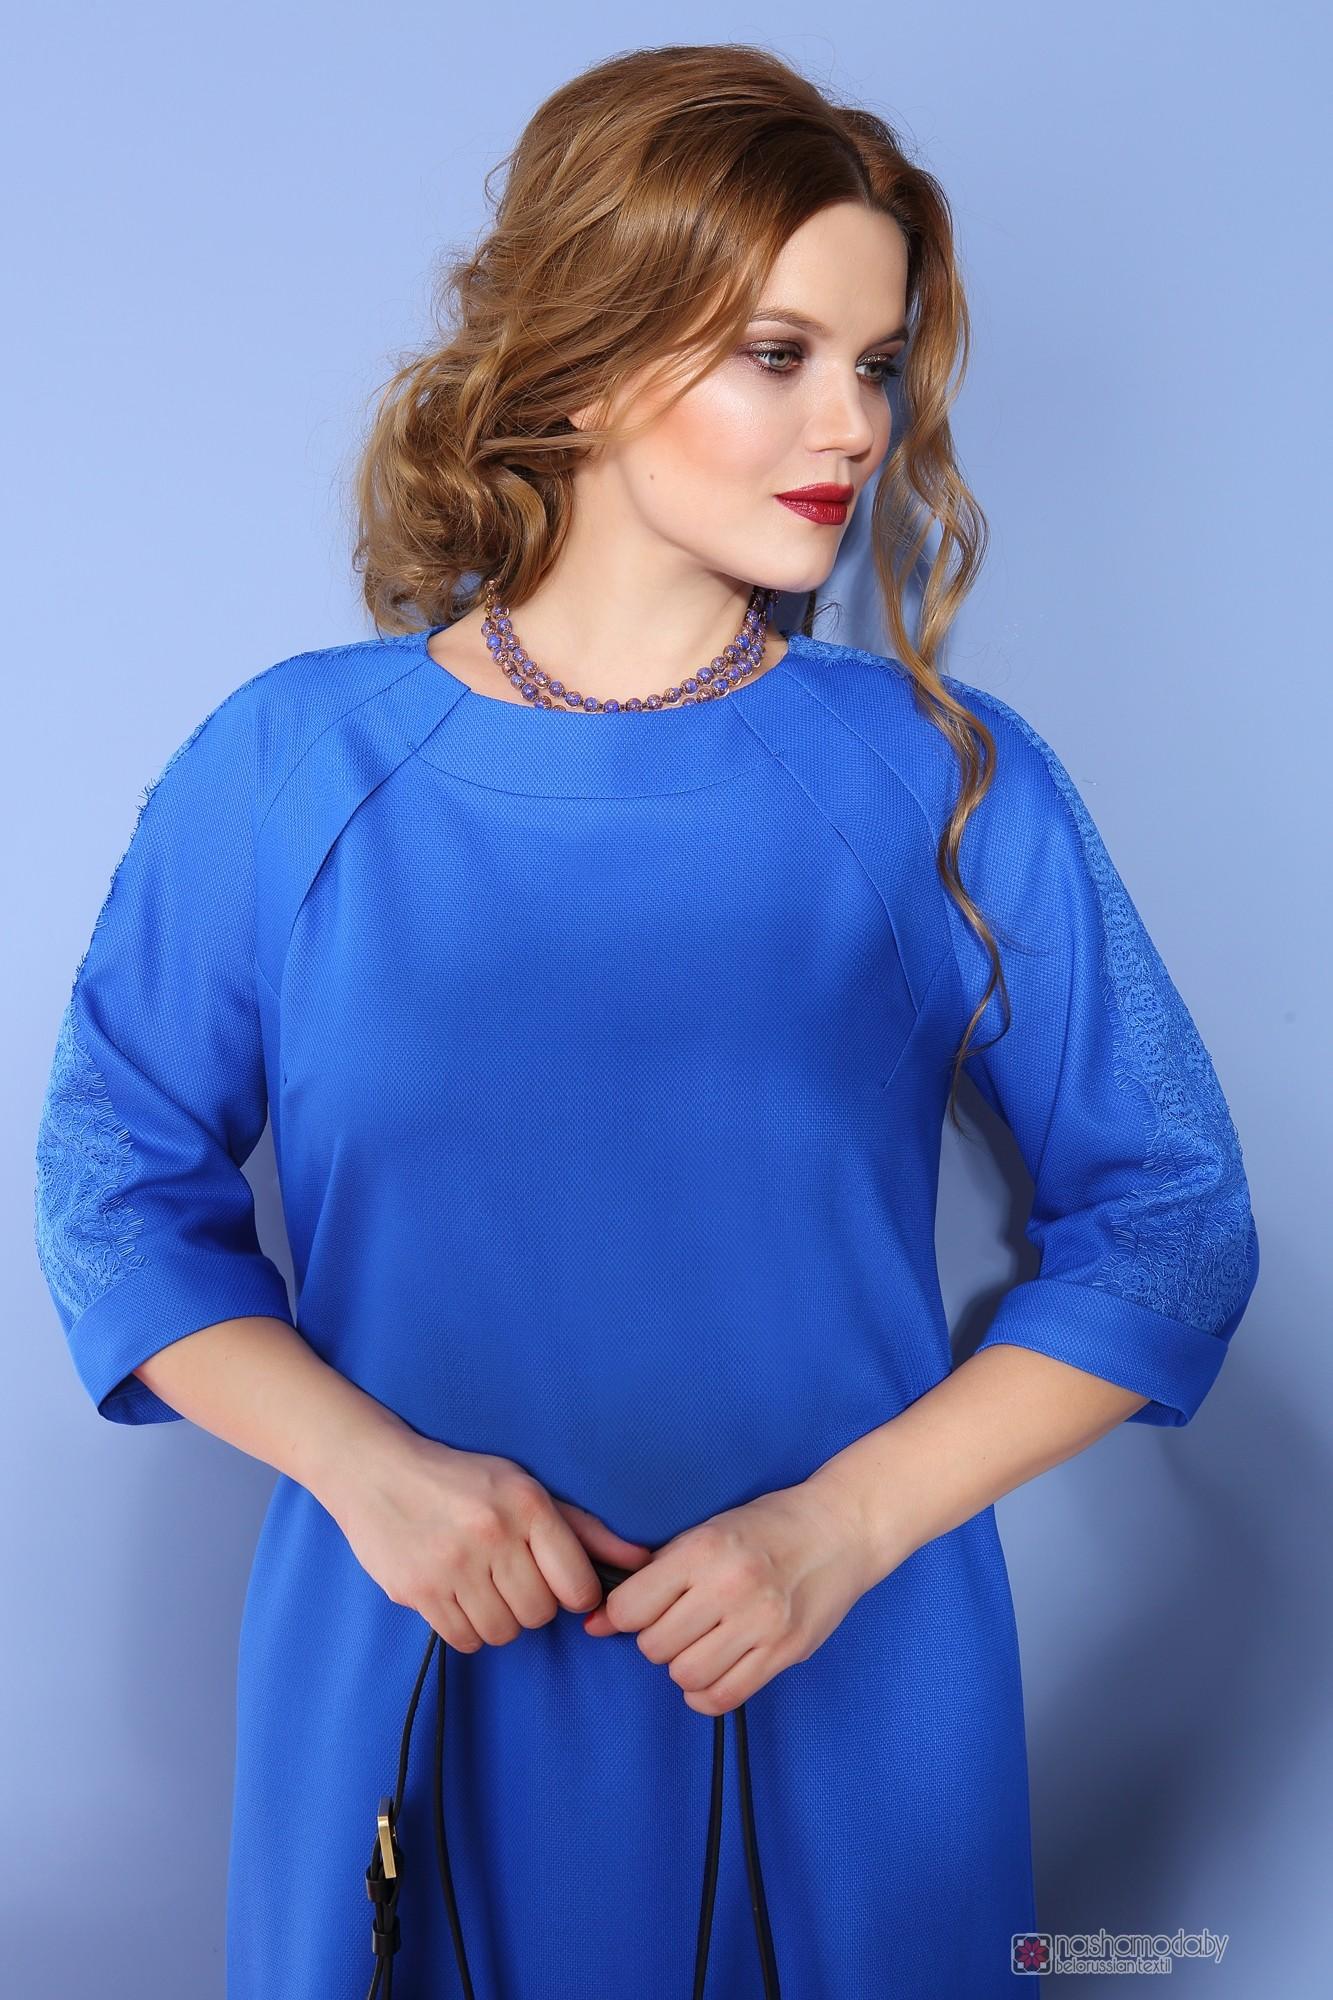 d7ea606f6659 ... Повседневные платья Anna Majewska 996 фото 3 ...